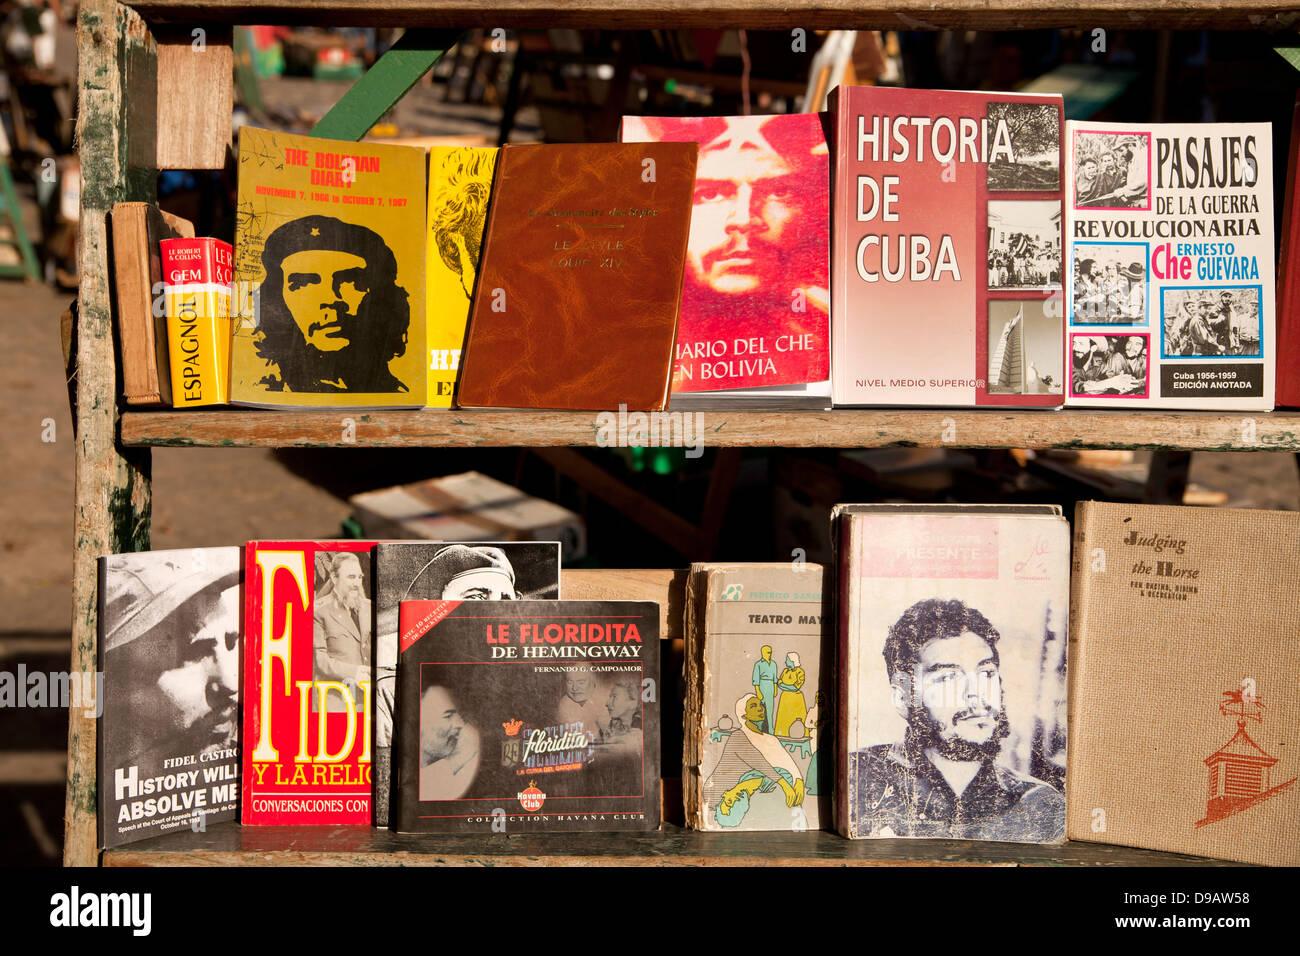 books about cuban history, Havana, Cuba, Caribbean - Stock Image